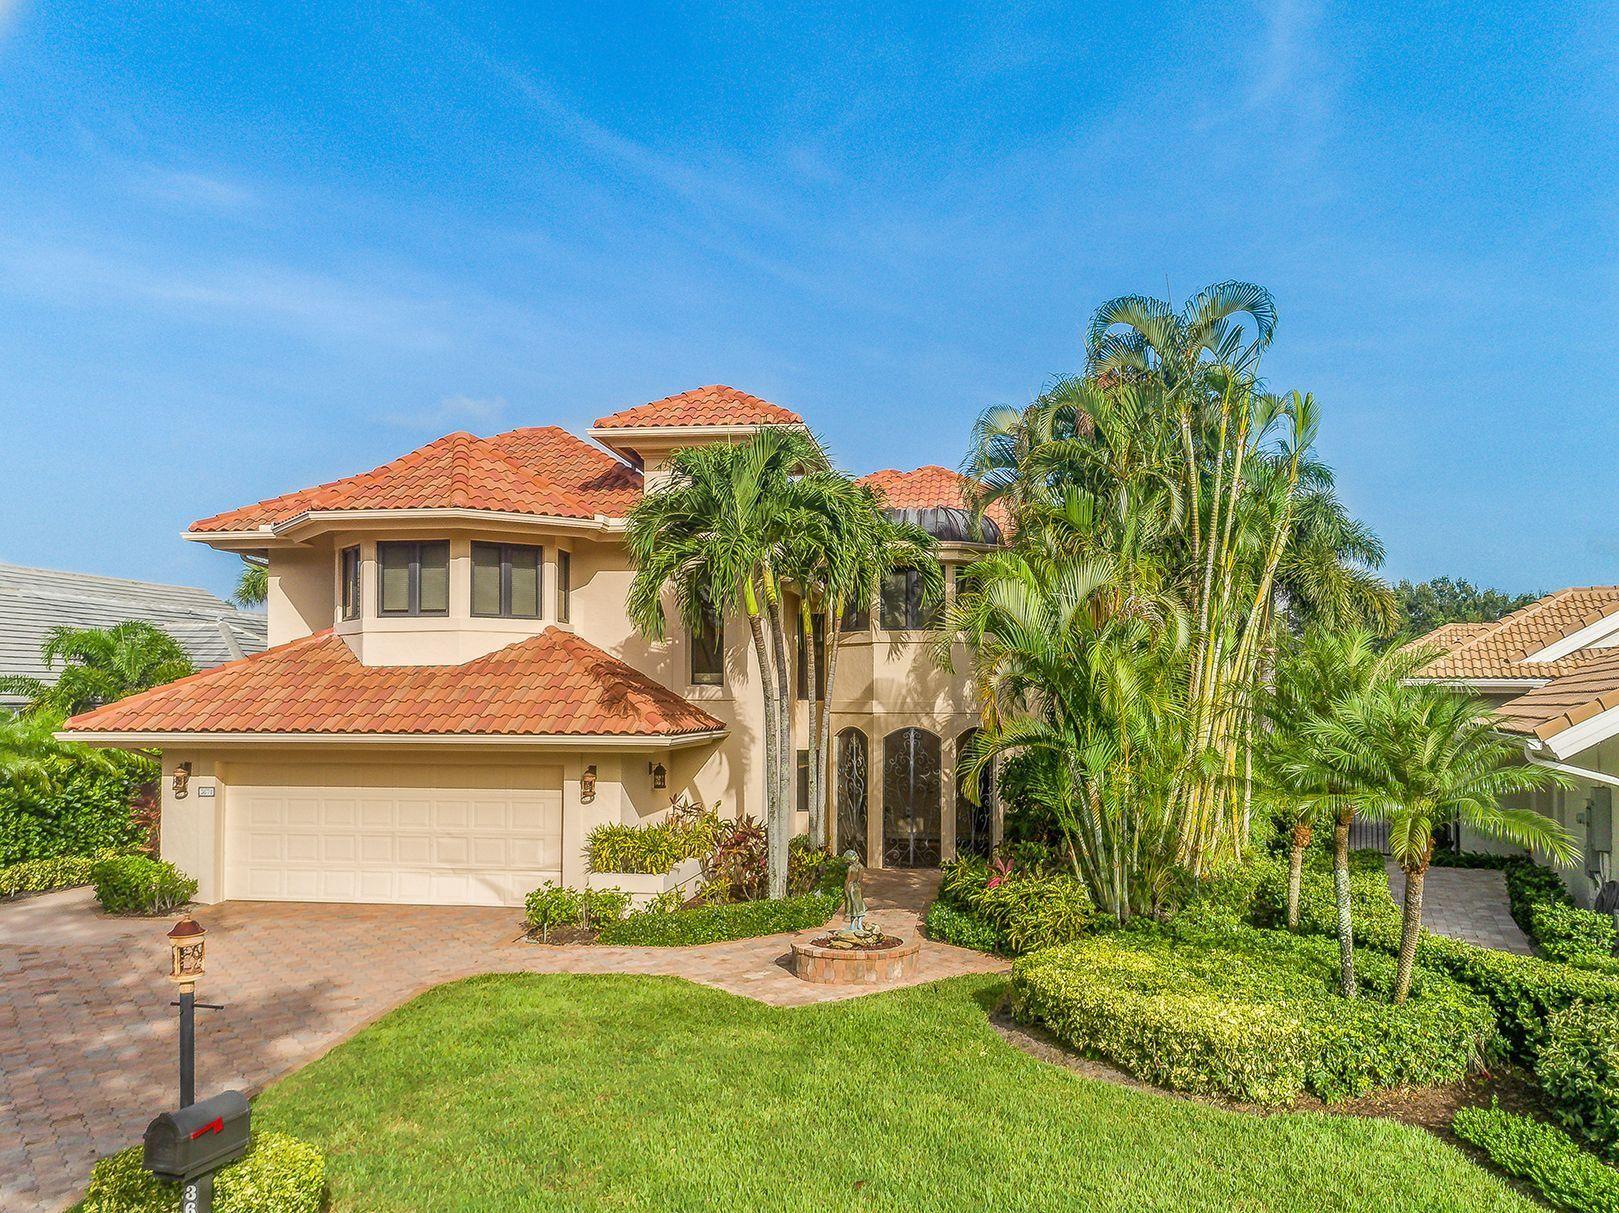 Photo of 3671 Dijon Way, Palm Beach Gardens, FL 33410 (MLS # RX-10662797)